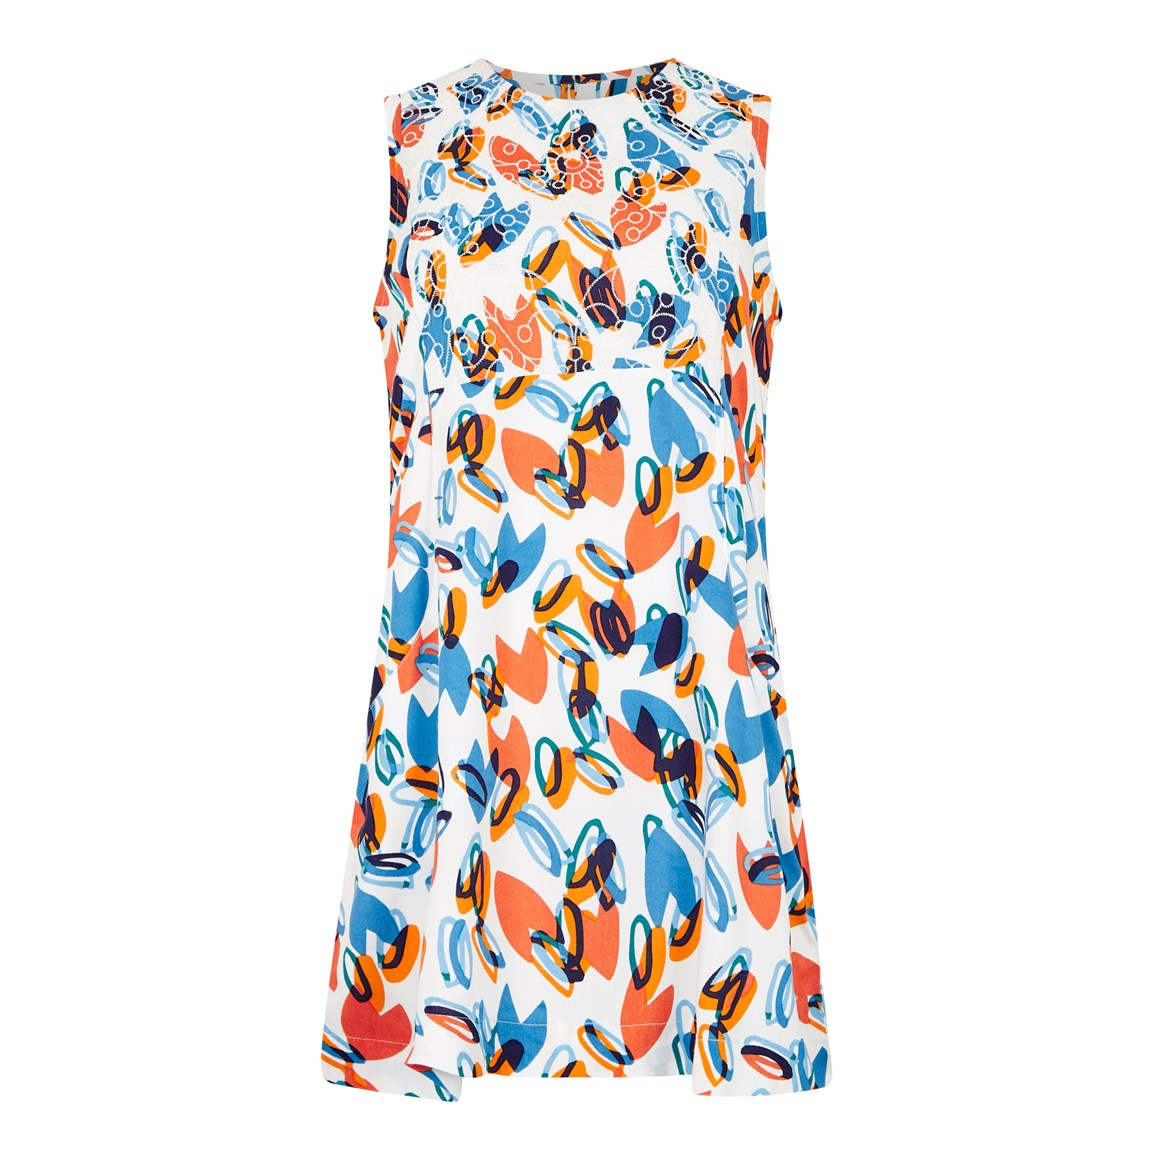 CHEAP Weird Fish Sachi Printed Lightweight Tunic Blue Wash Size 20 26100650807 – Men's Tops